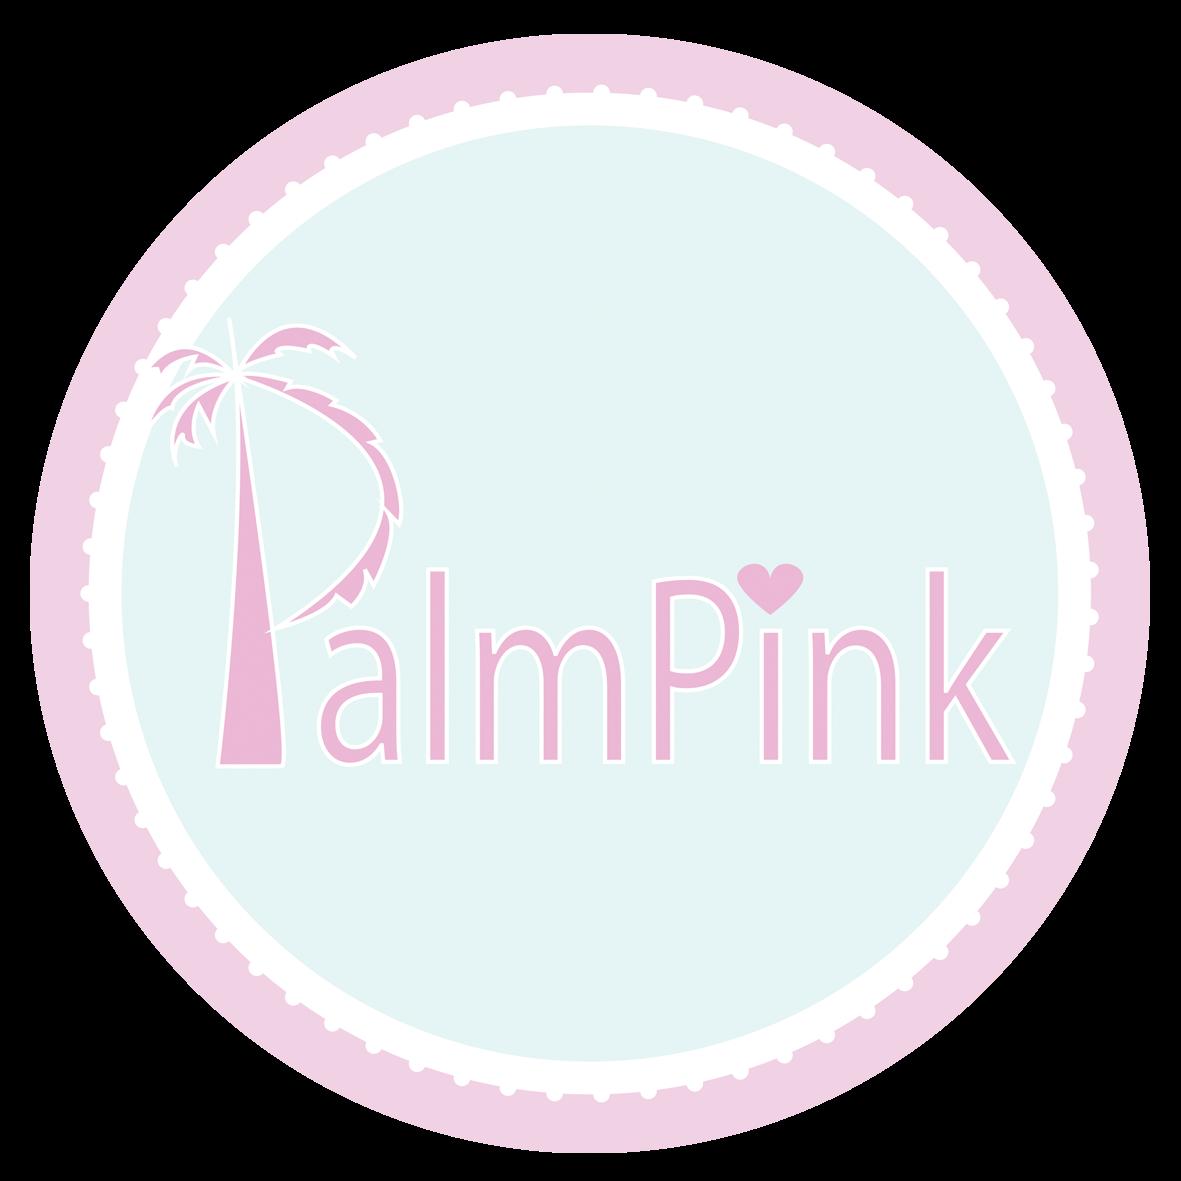 PalmPink